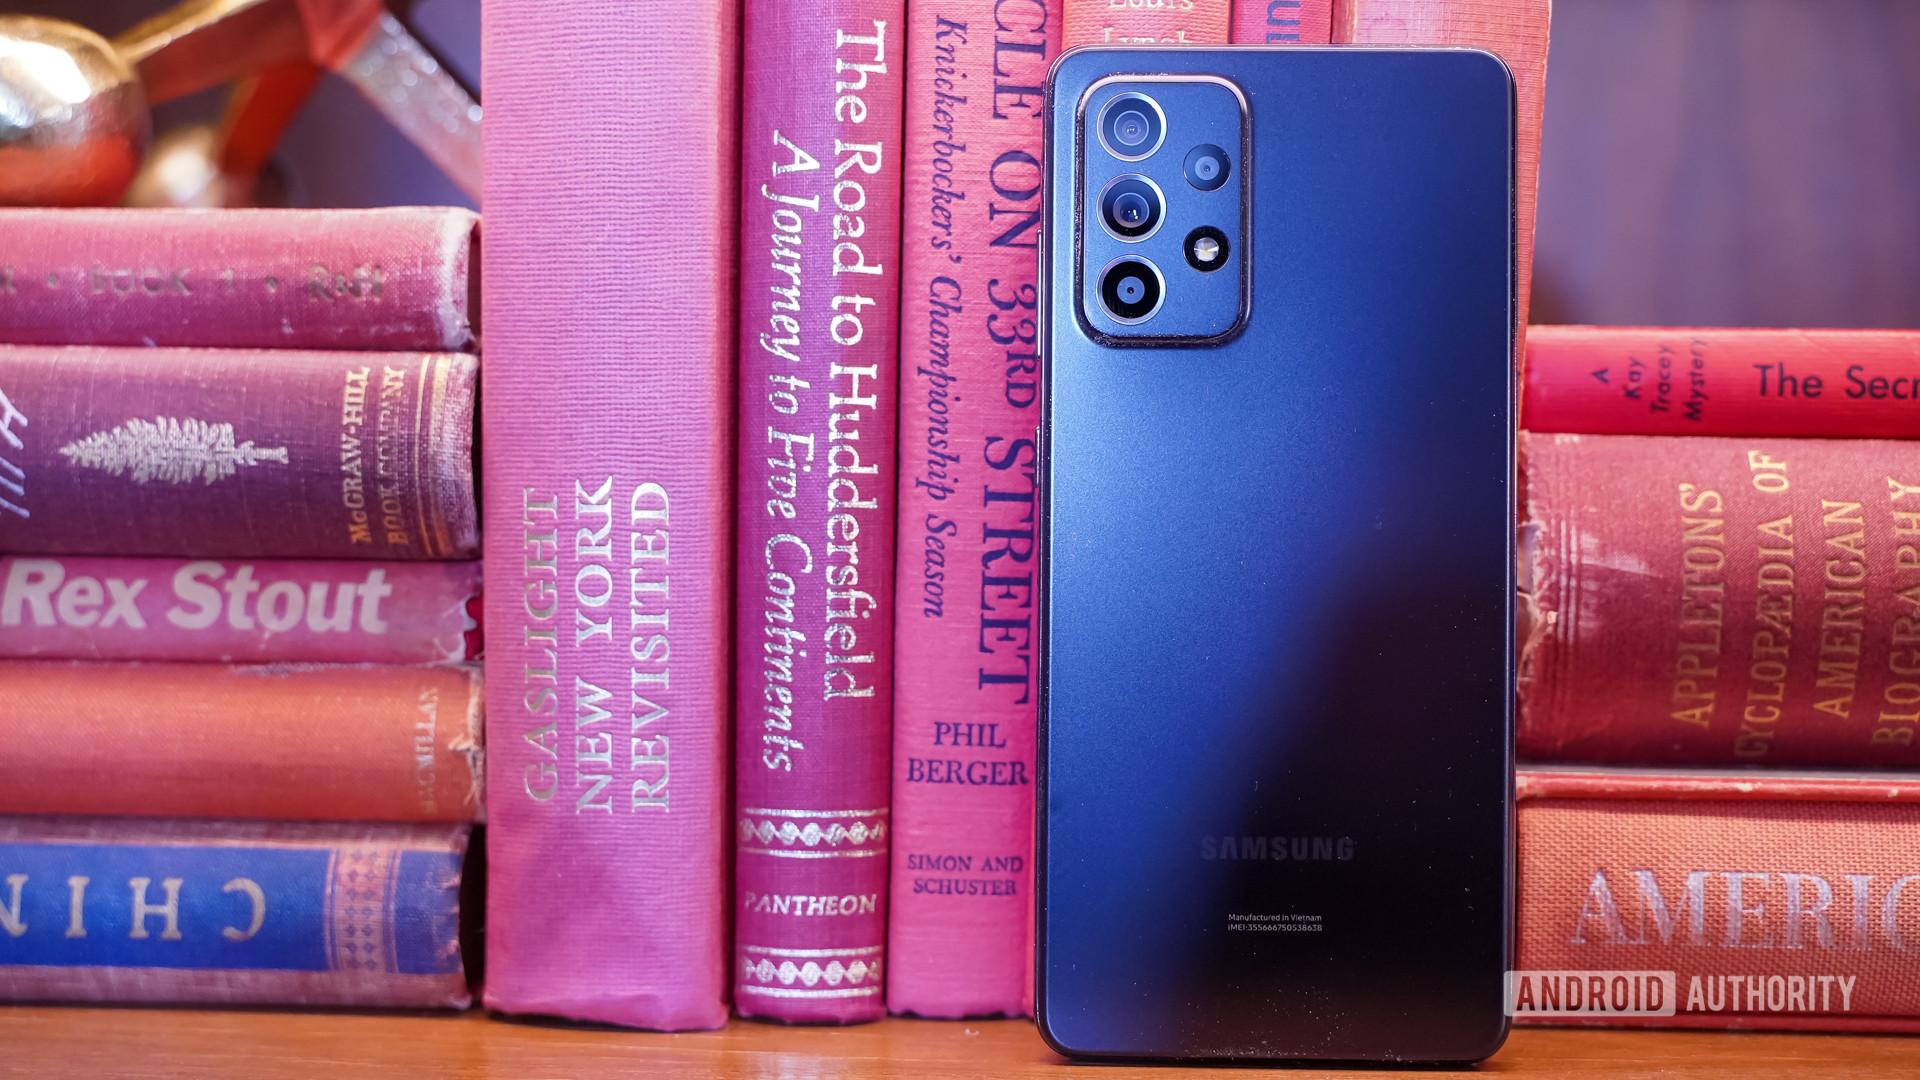 Samsung Galaxy A 52 5G rear with books